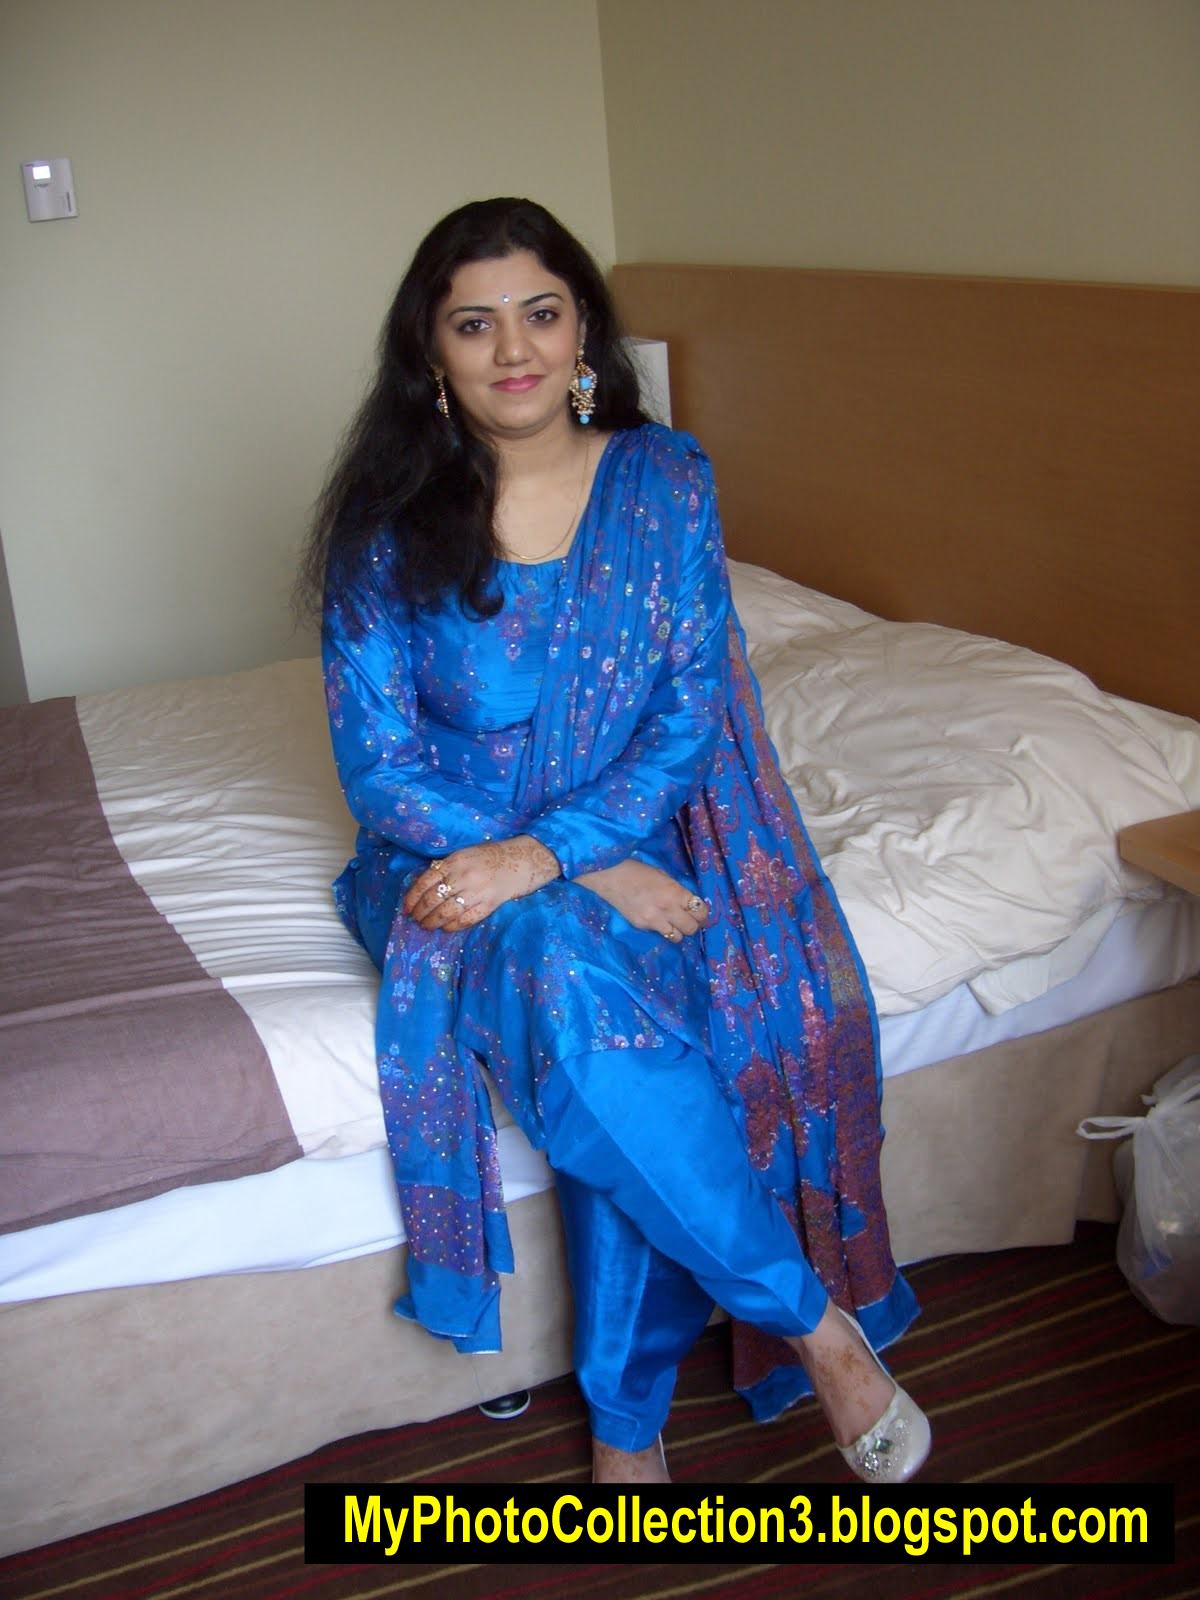 My Photo Collection Hot Pakistani Girl In Salwar-3378